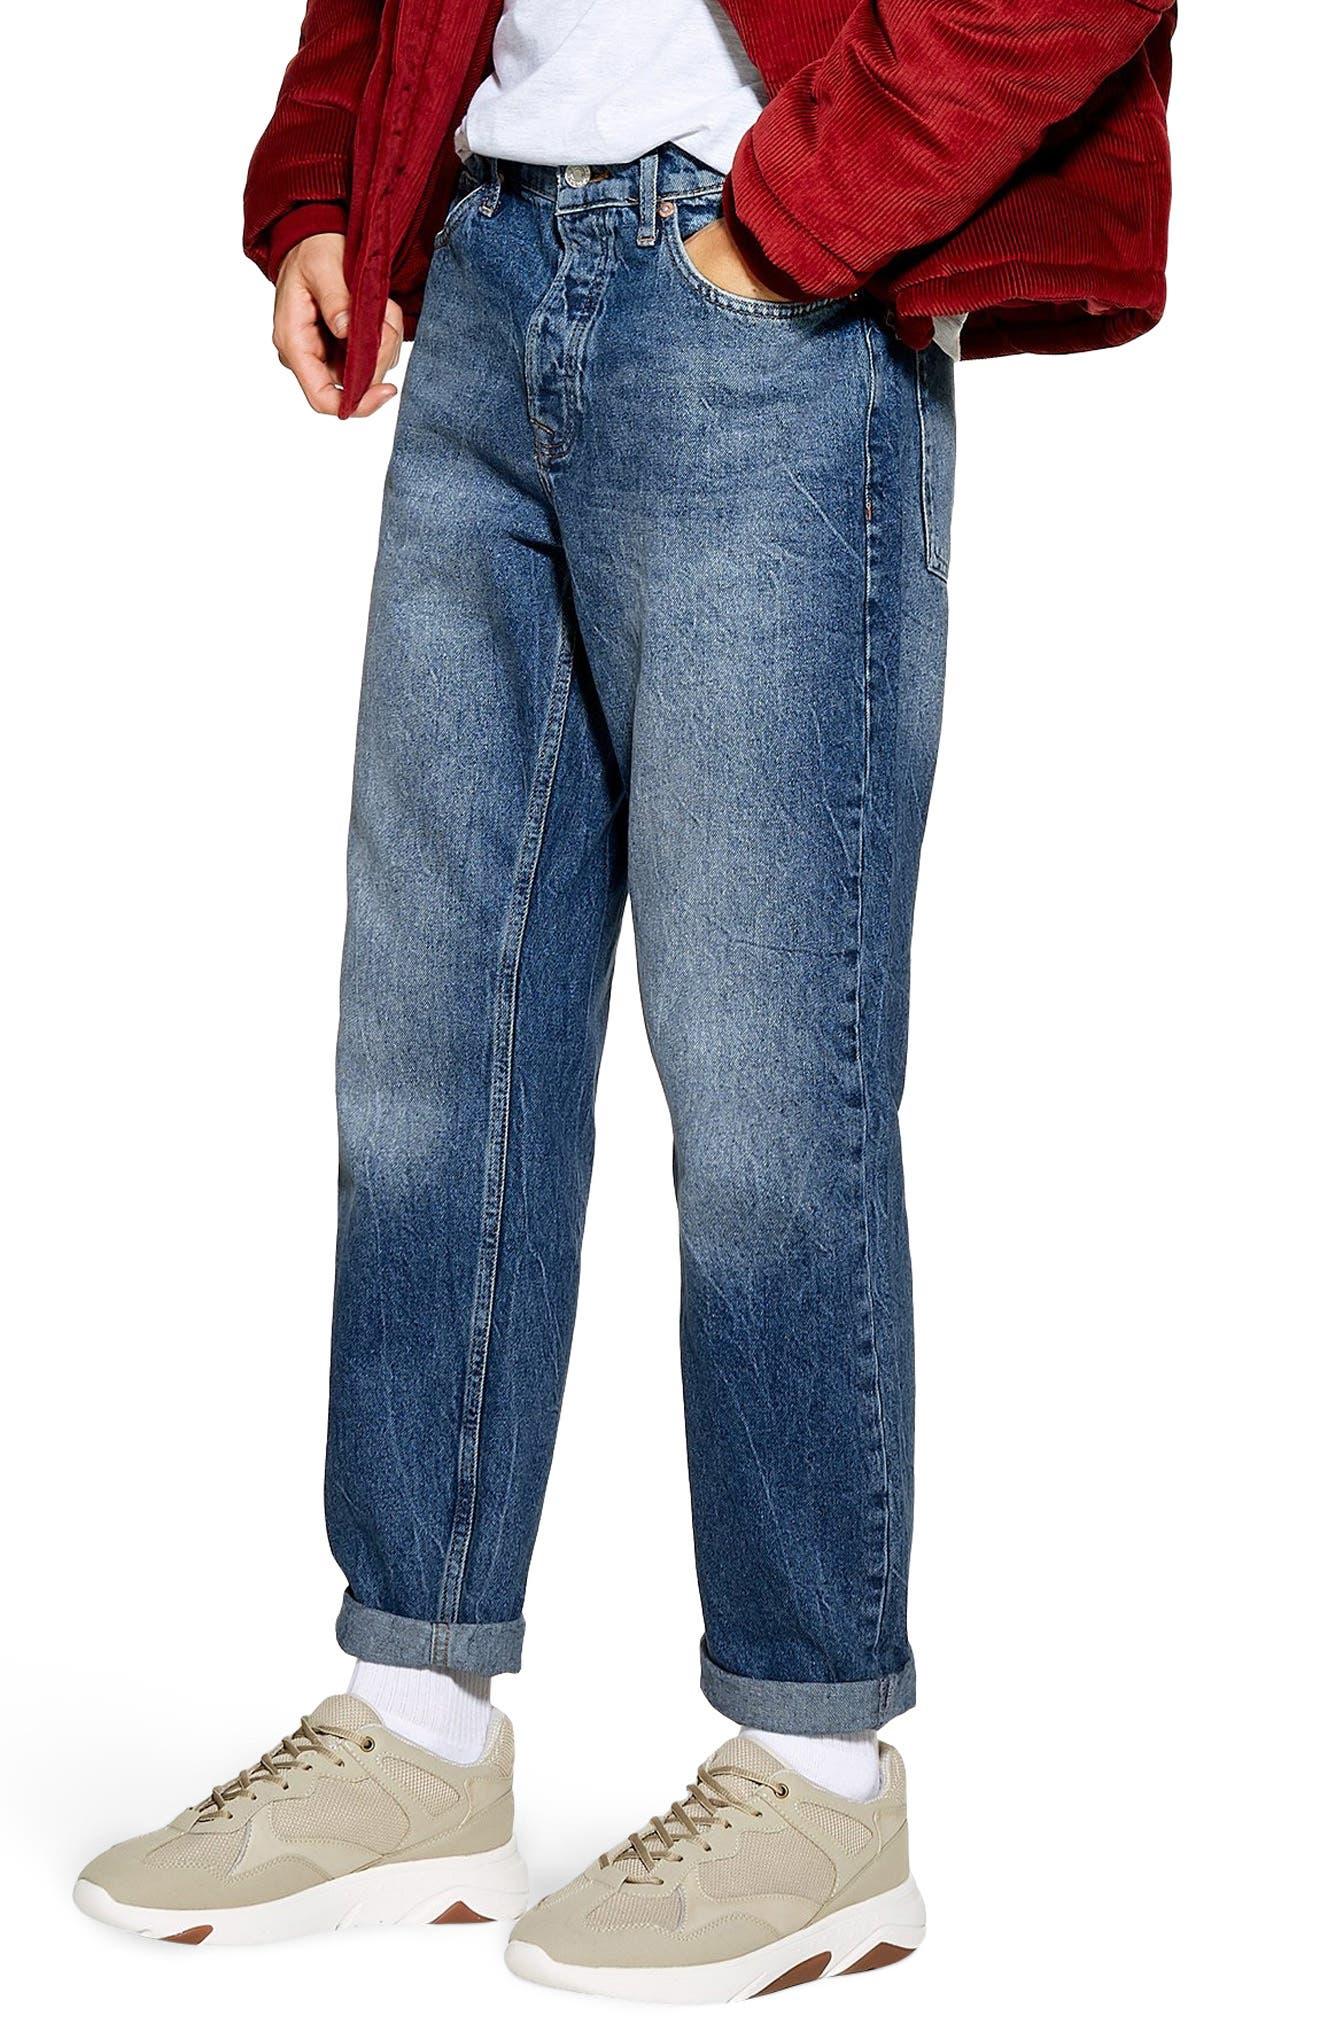 TOPMAN, Billy Original Fit Jeans, Main thumbnail 1, color, BLUE